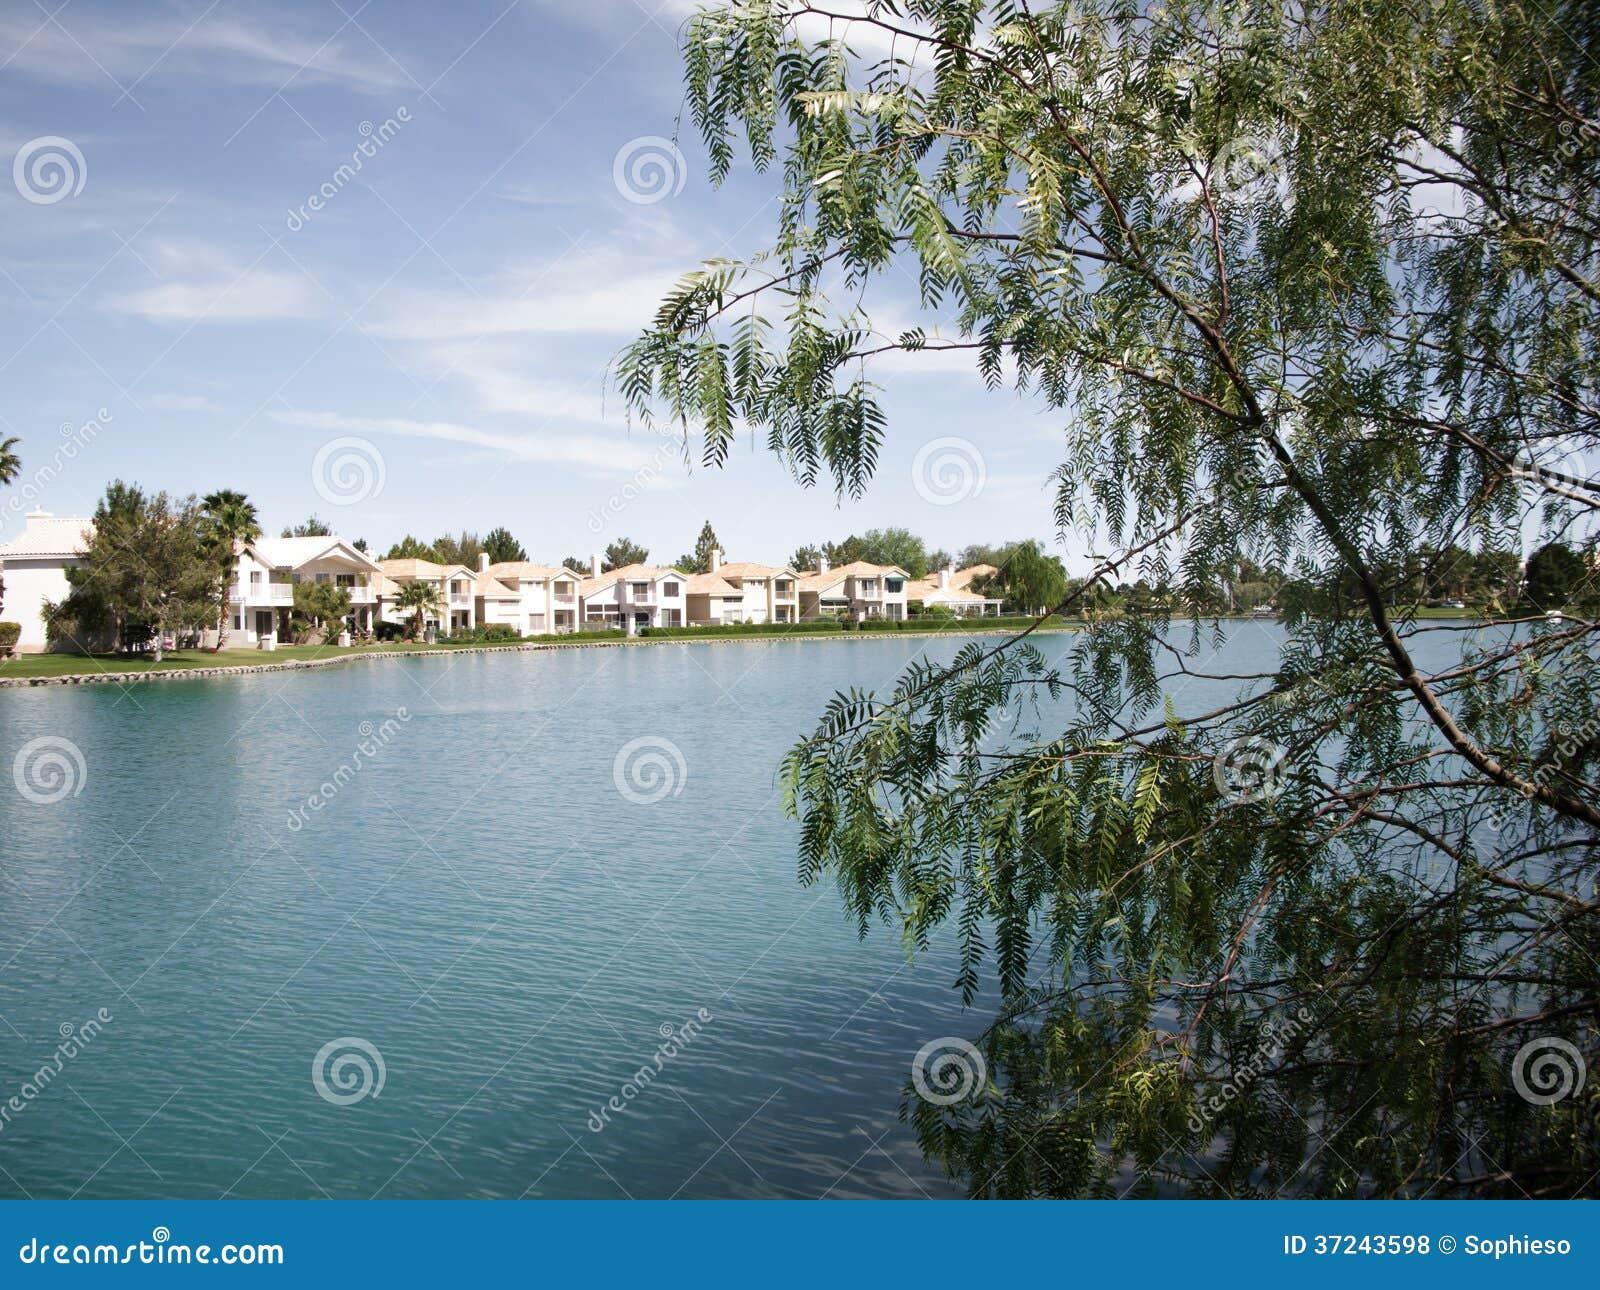 Luxury Condominiums On Man-Made Lake